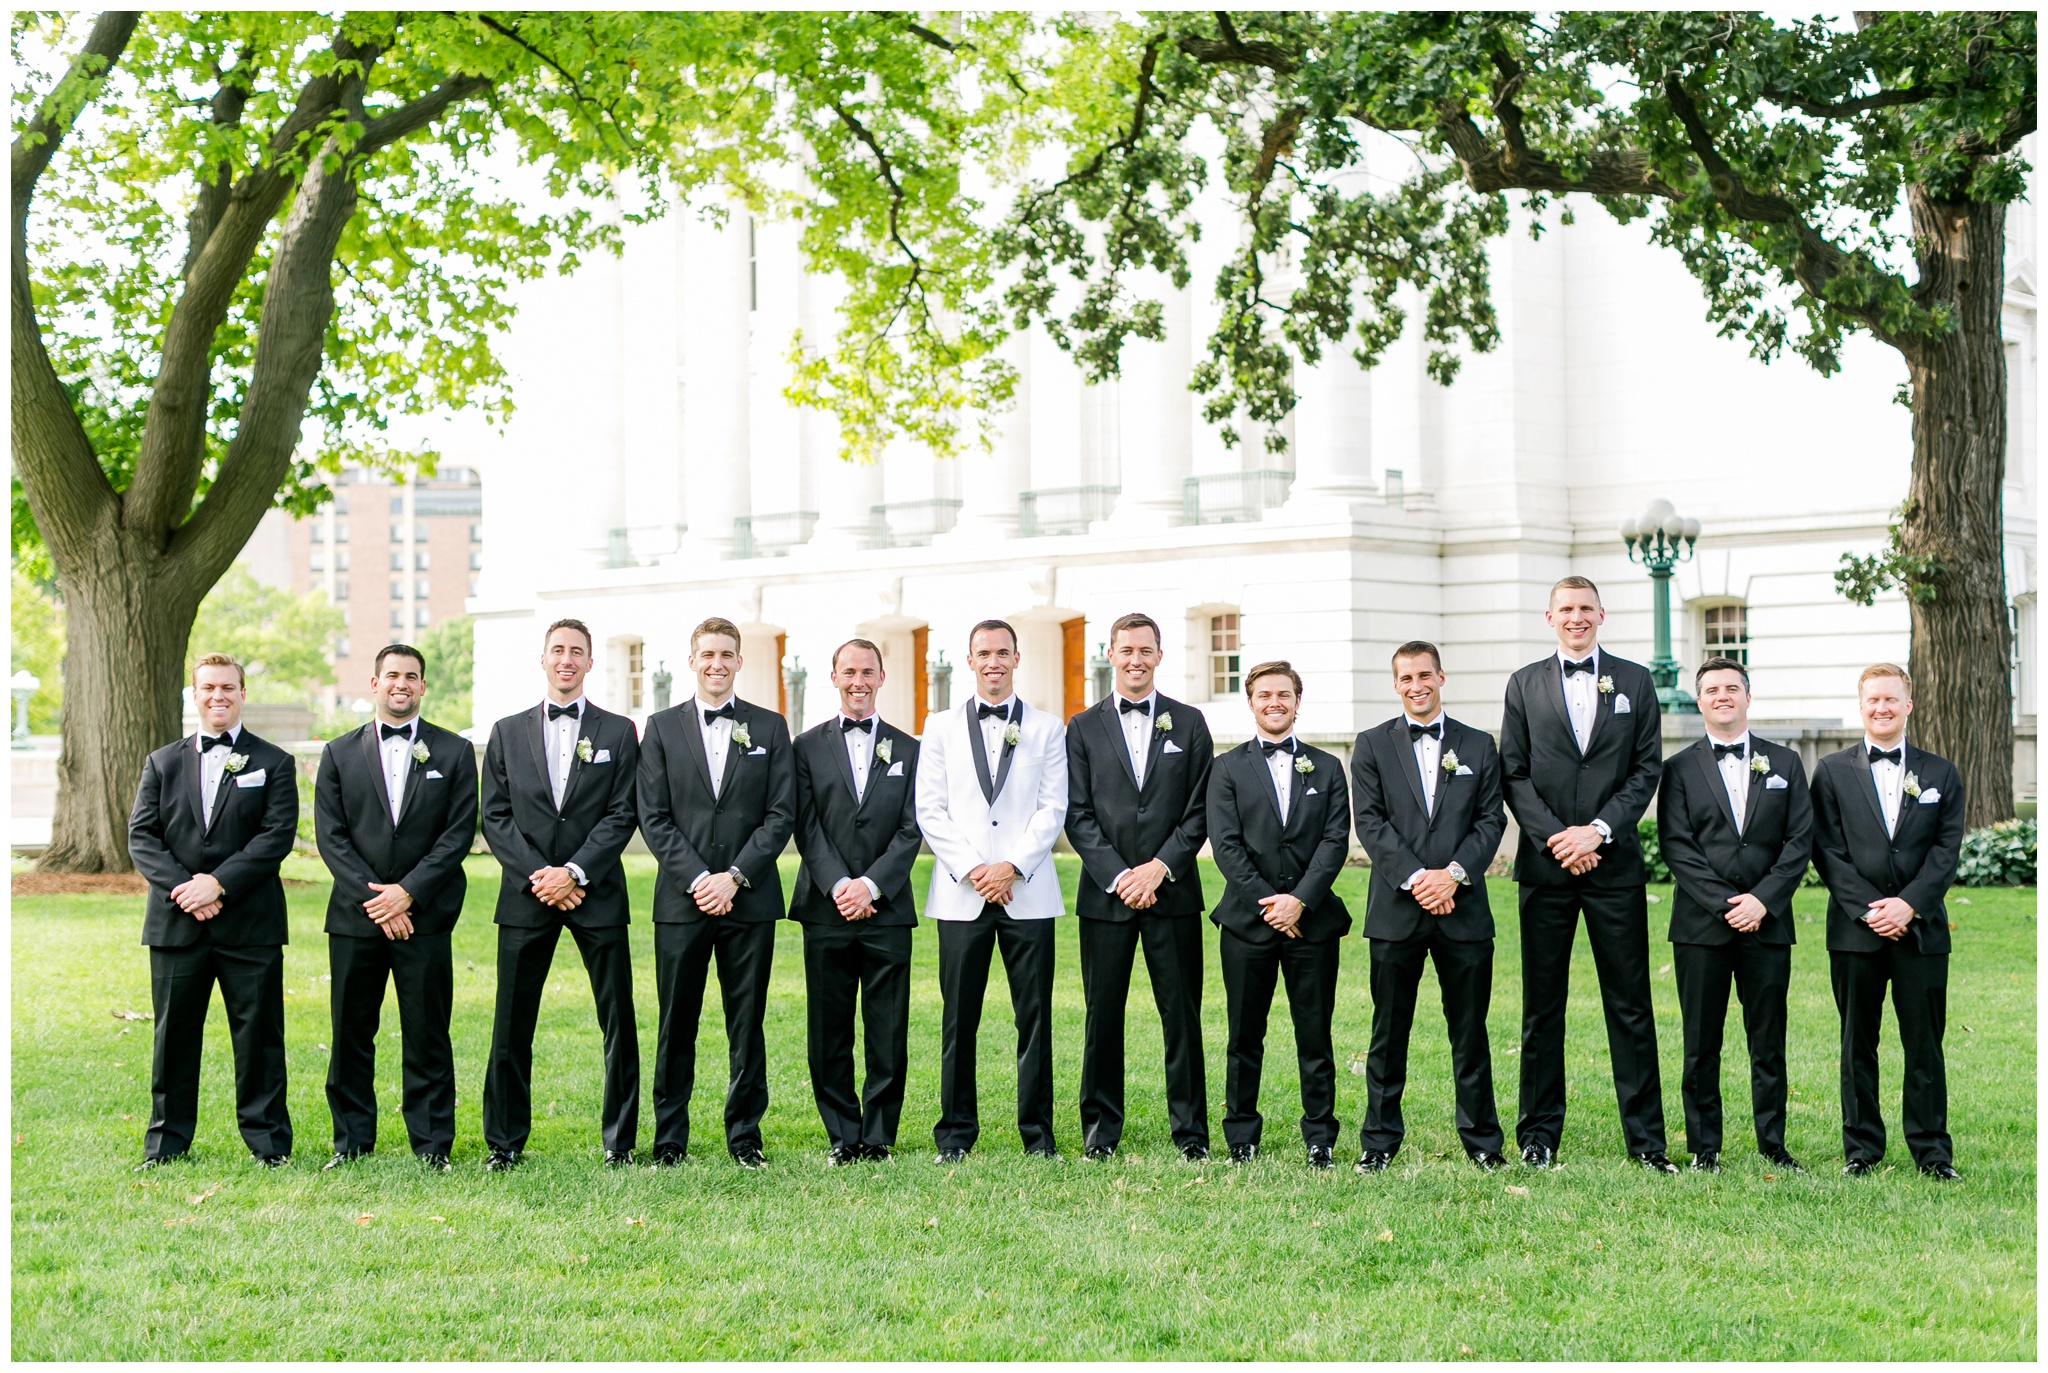 UW_Memorial_Union_wedding_madison_wisconsin_wedding_photographers_4616.jpg